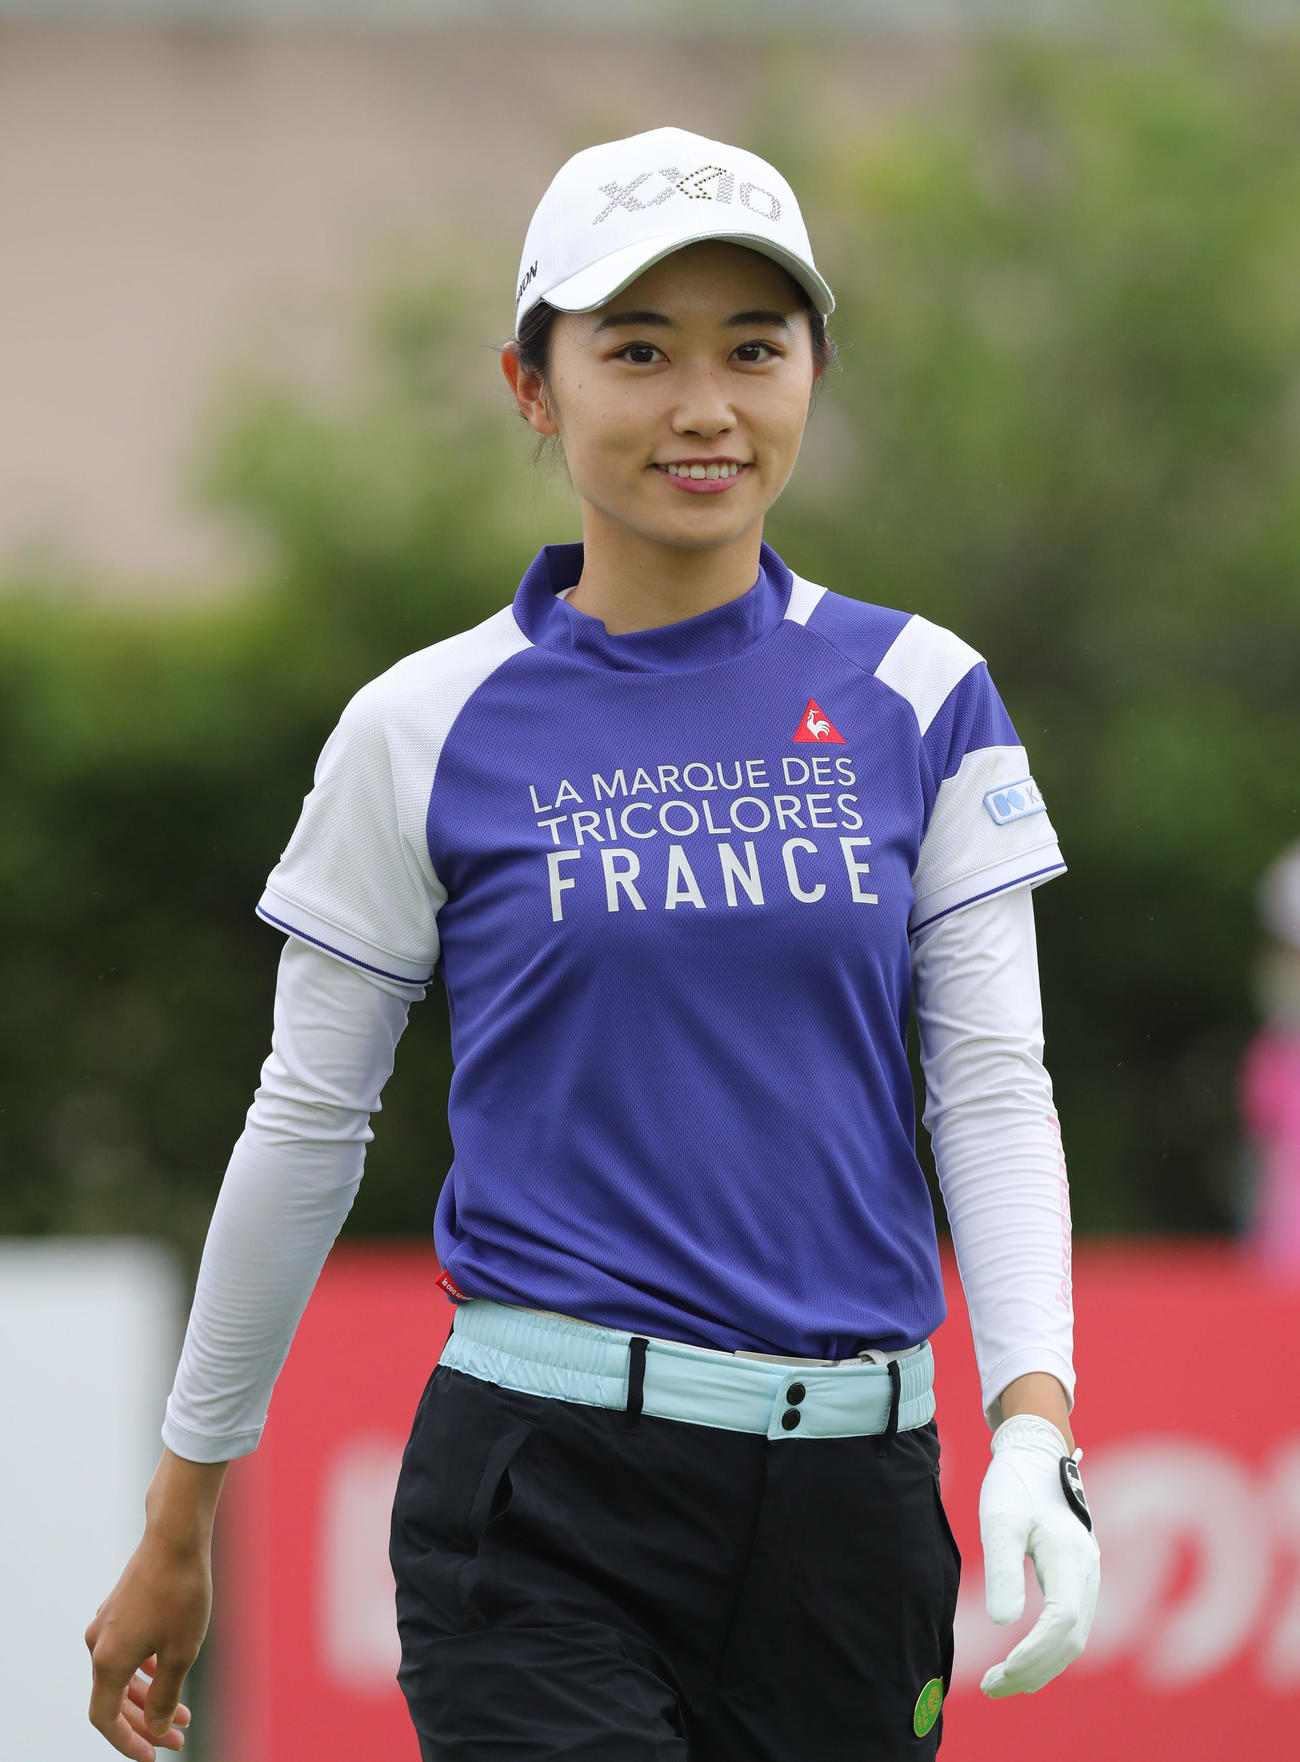 https://www.nikkansports.com/sports/golf/news/img/202105150000104-w1300_7.jpg